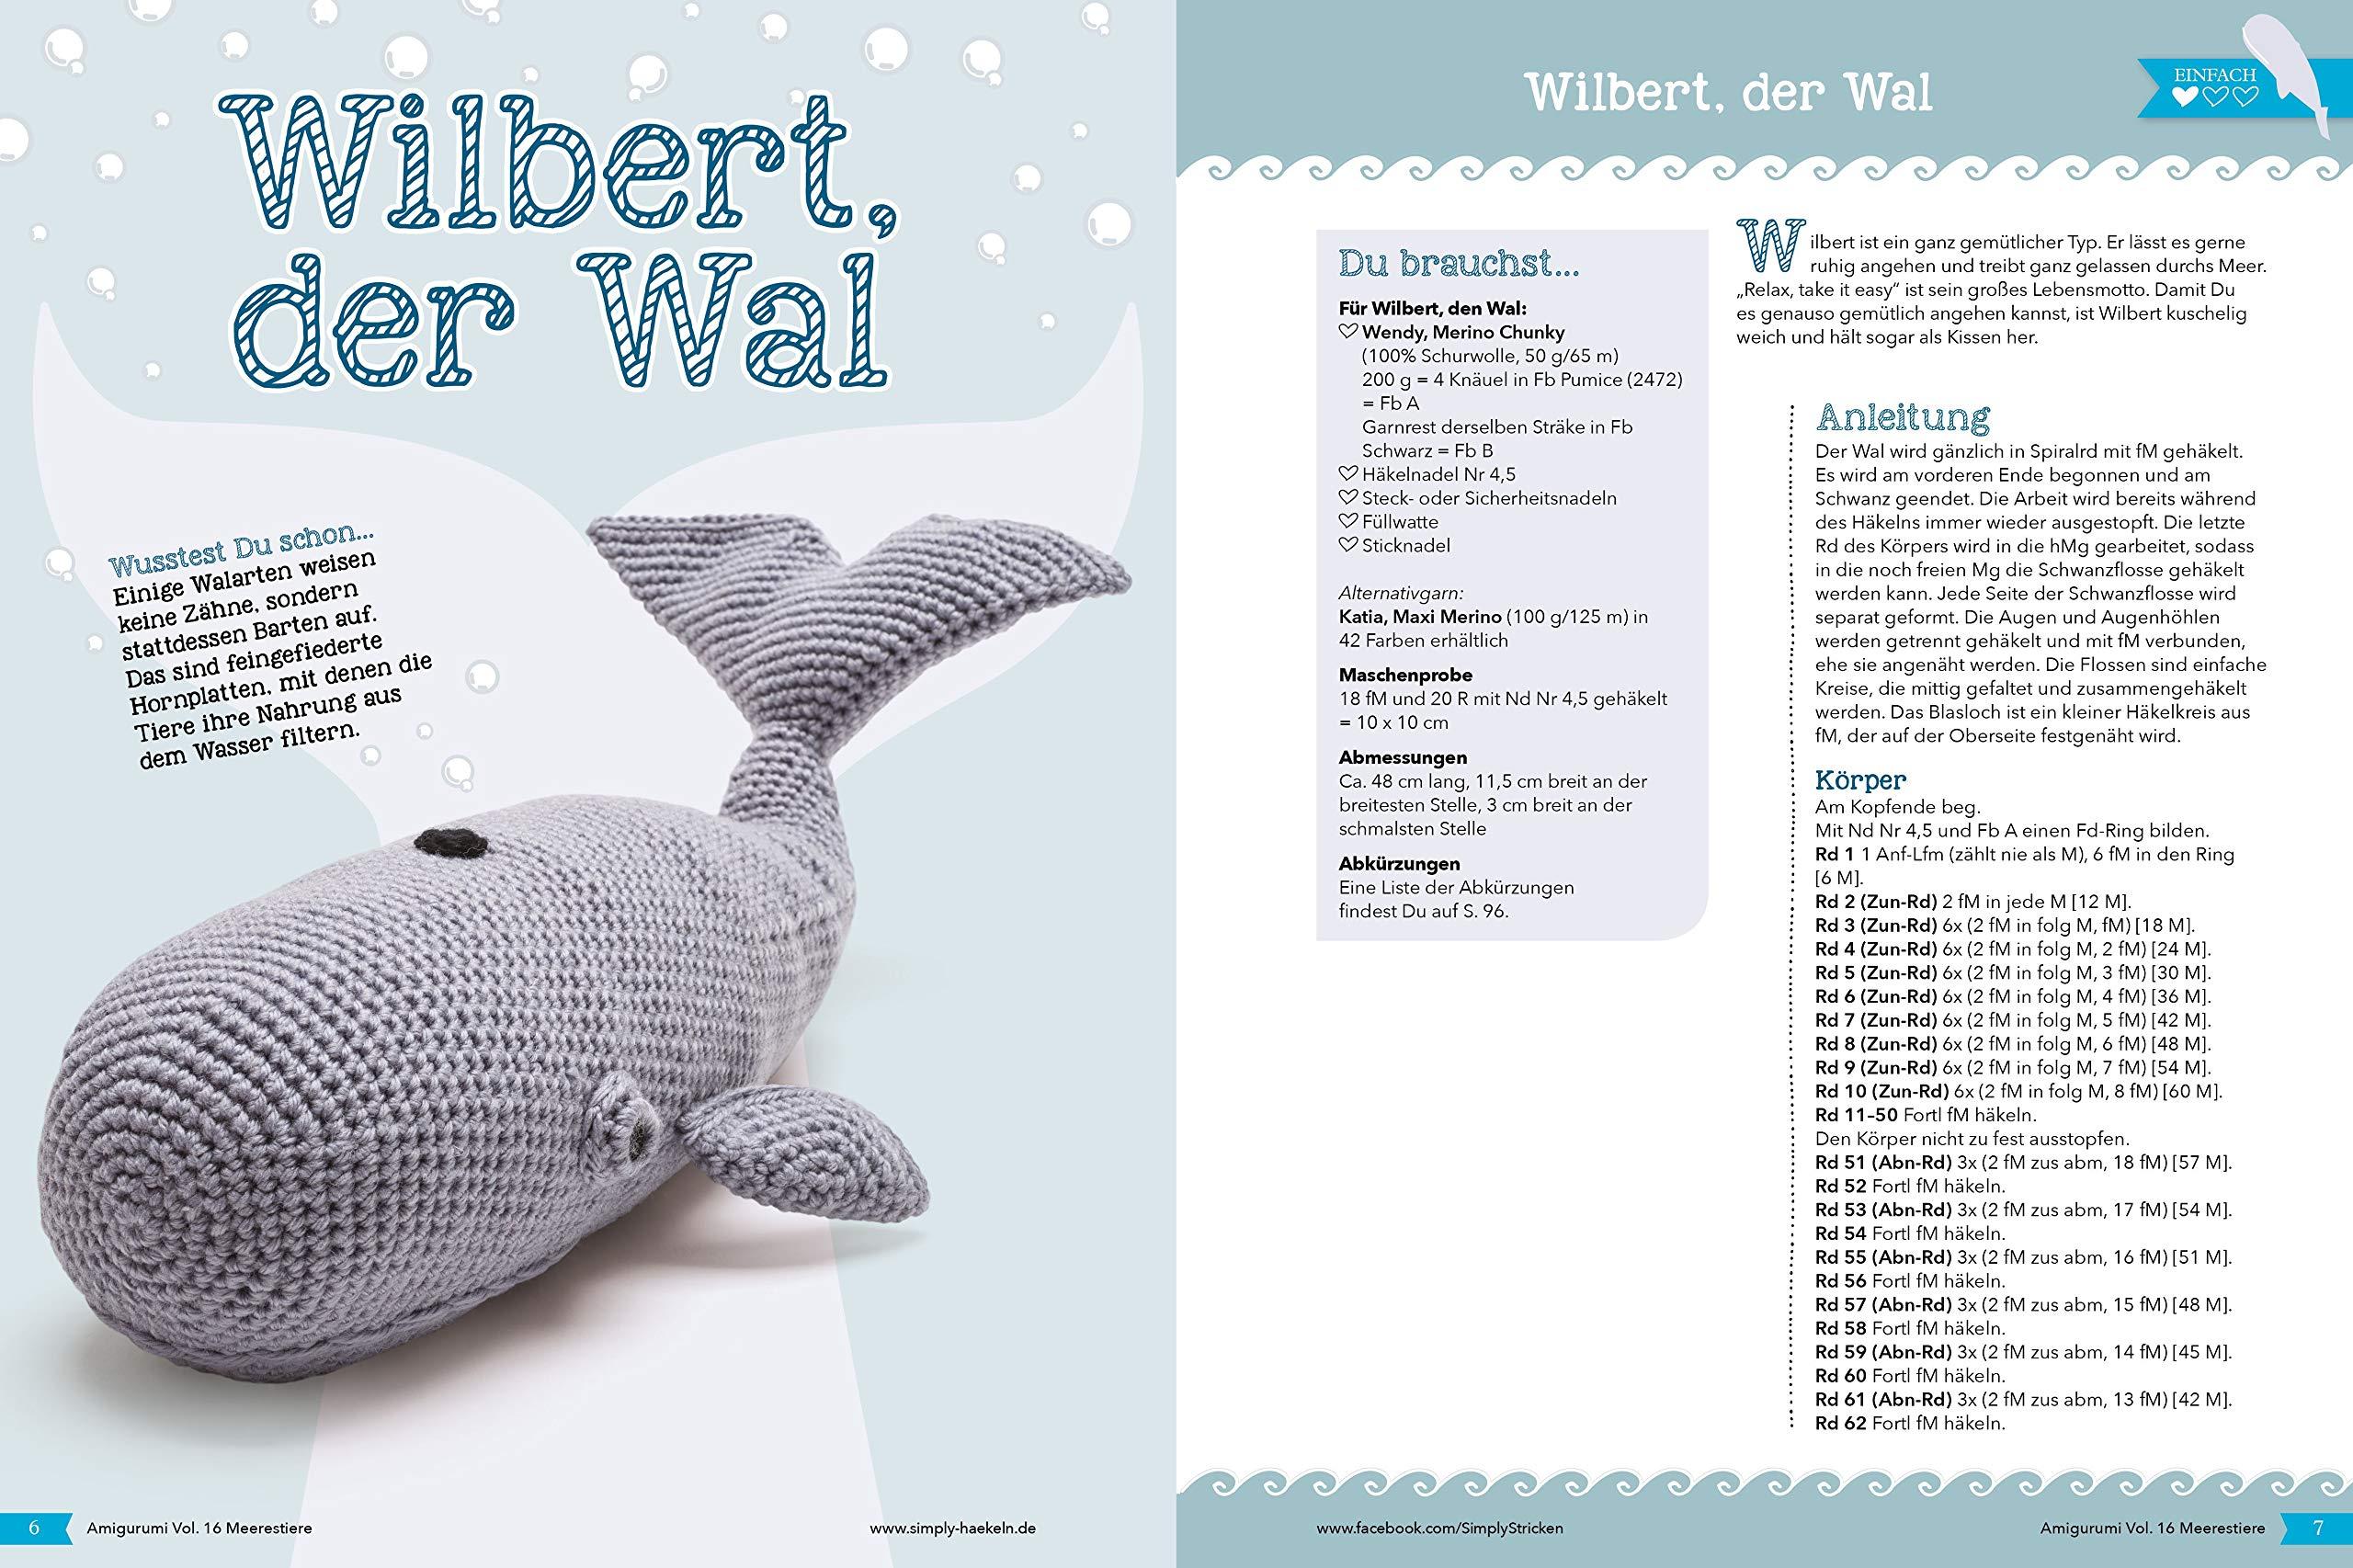 DIY-Anleitung: Amigurumi-Wal mit Rettungsring häkeln via DaWanda ... | 1706x2560